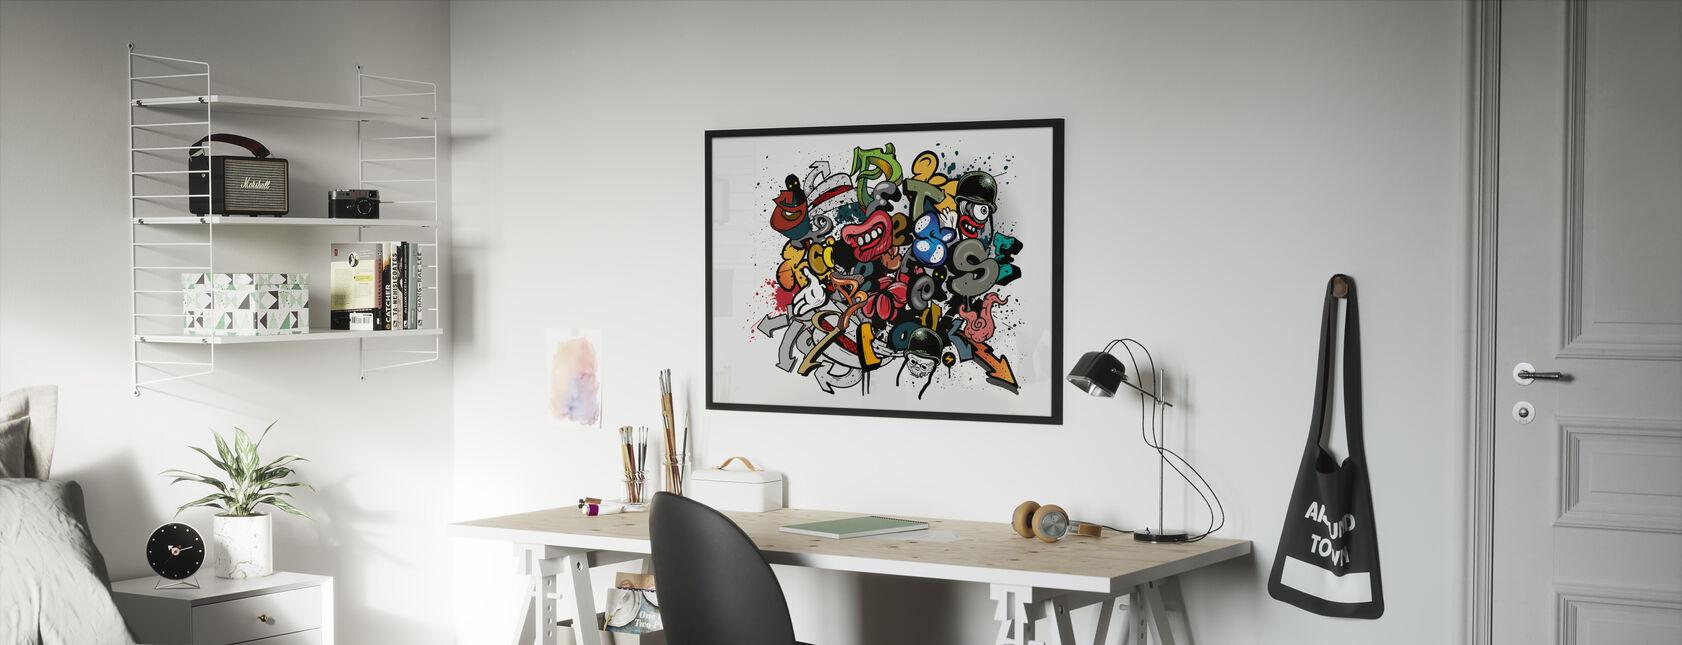 Graffiti-elementen - Ingelijste print - Kinderkamer